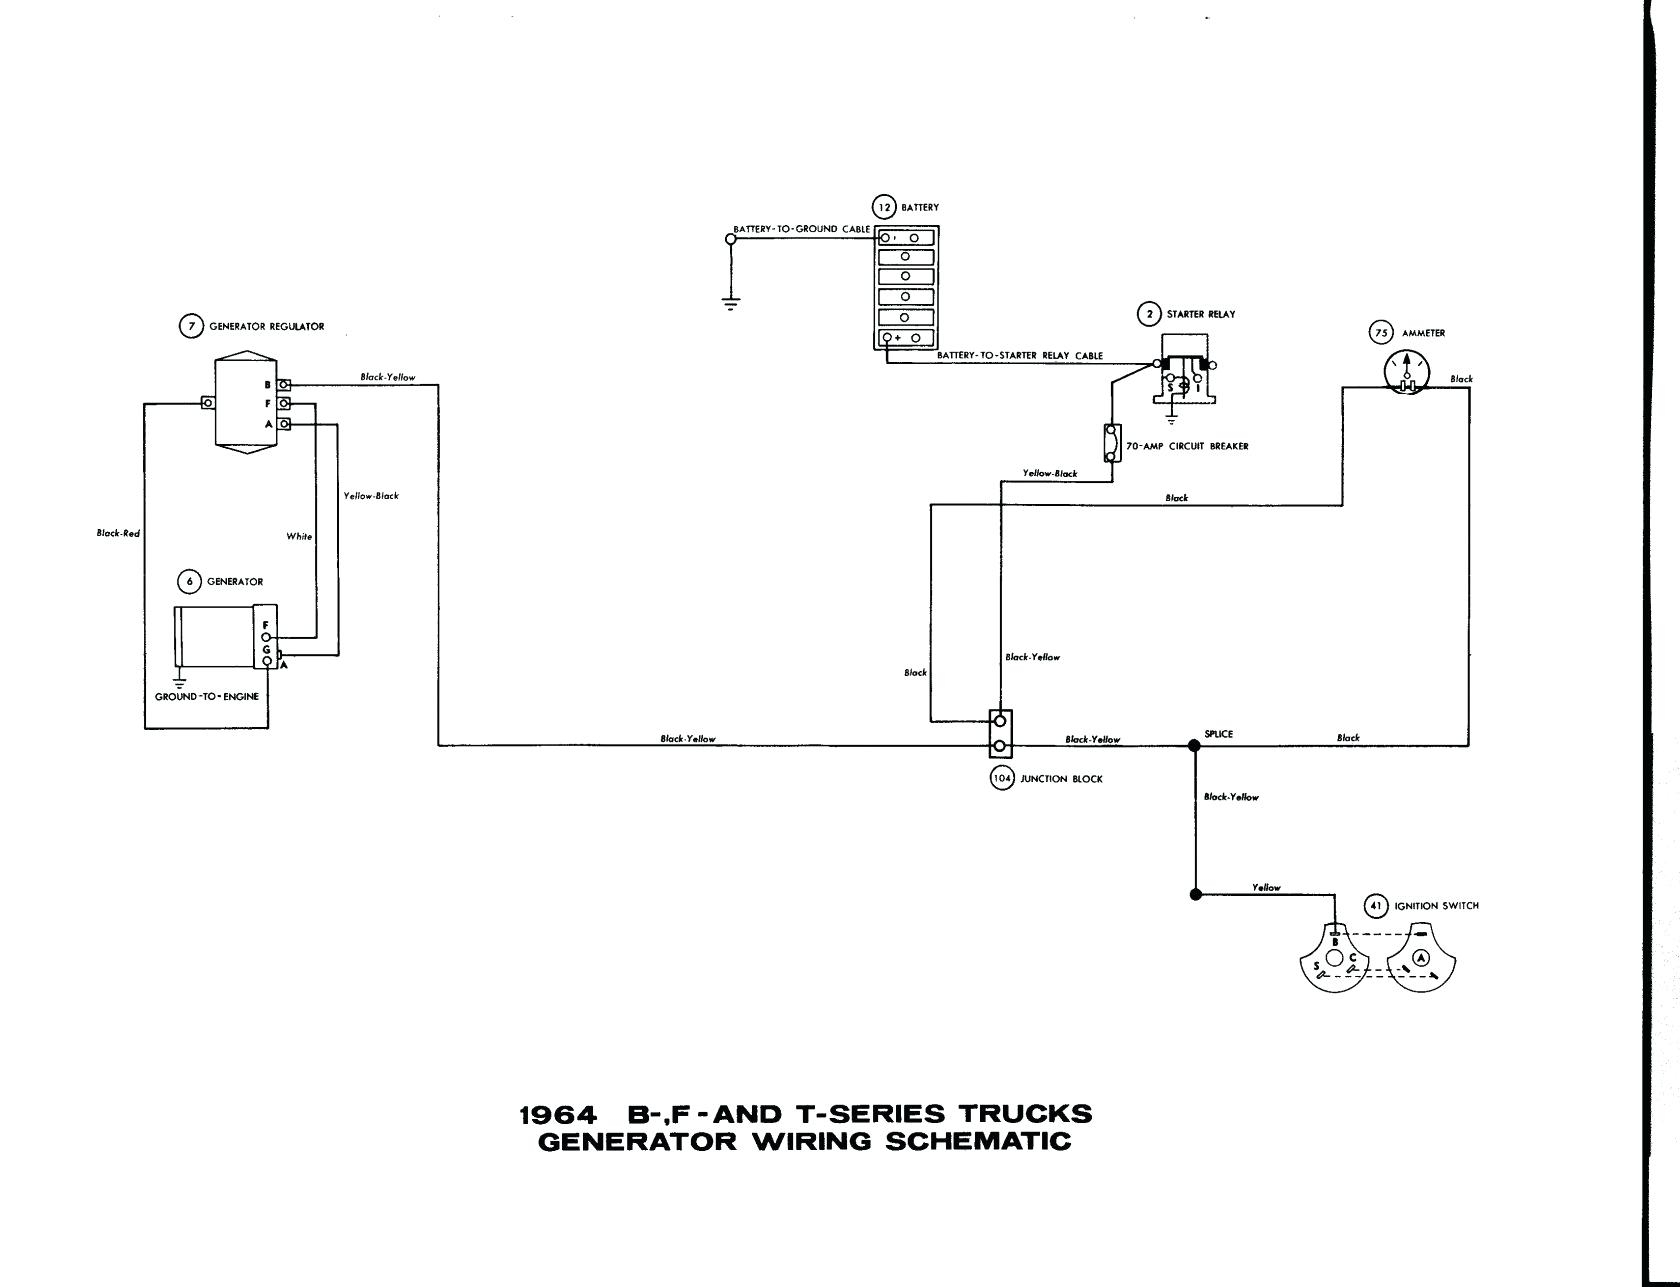 Delco Remy Cs130 Alternator Wiring Diagram Upgrades And Gm Lively 20 - Gm 4 Wire Alternator Wiring Diagram